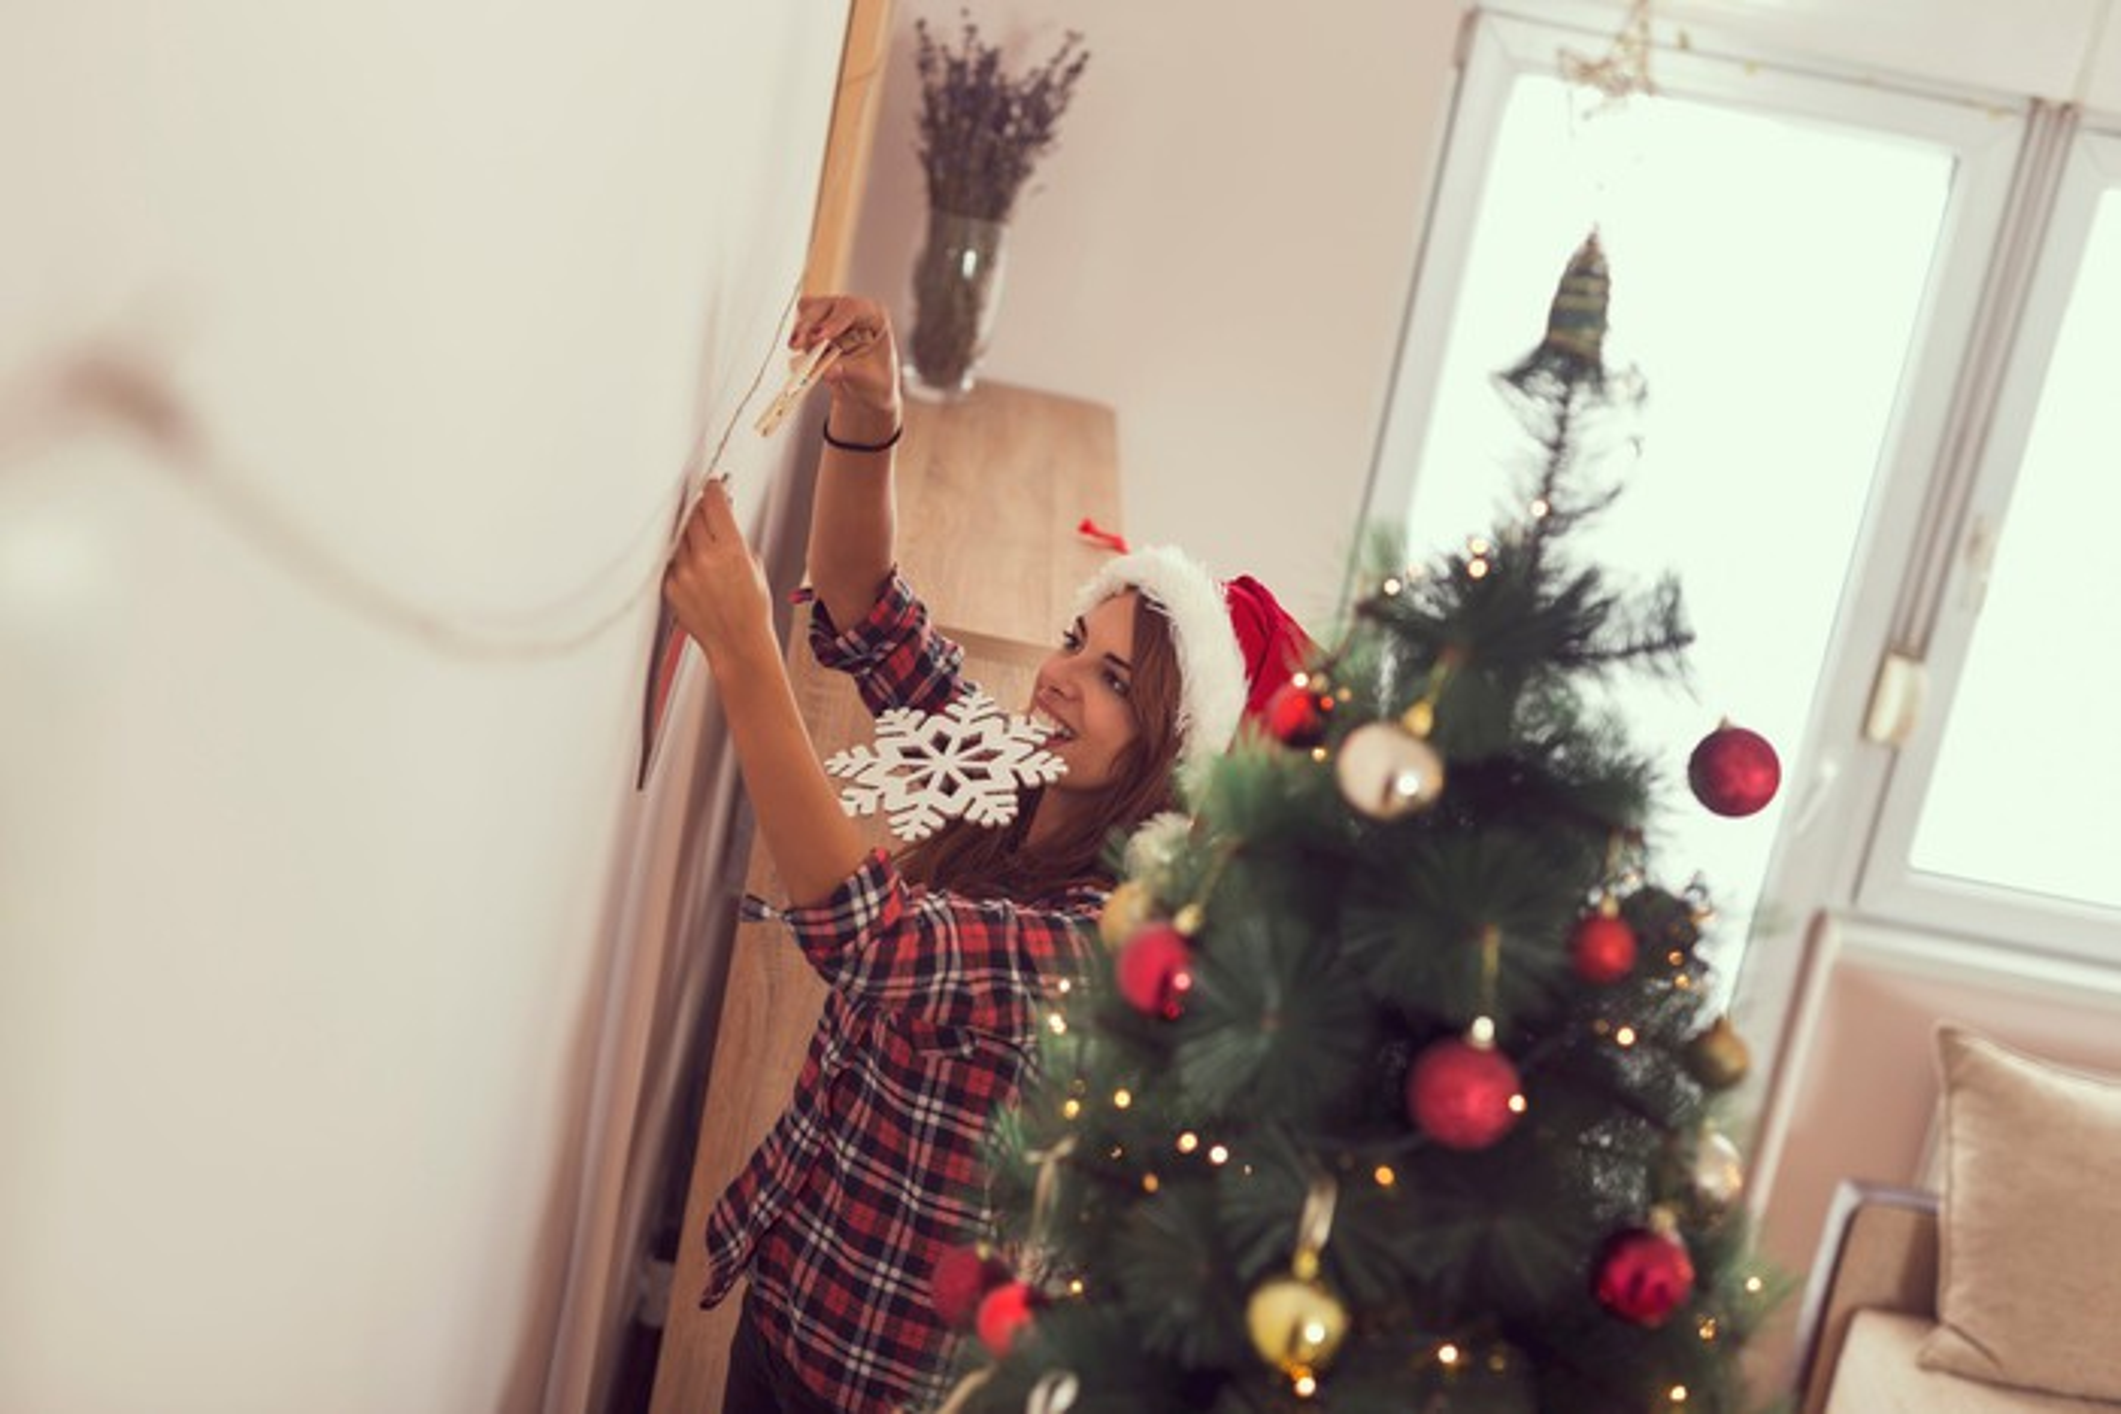 Woman hanging lights next to Christmas tree